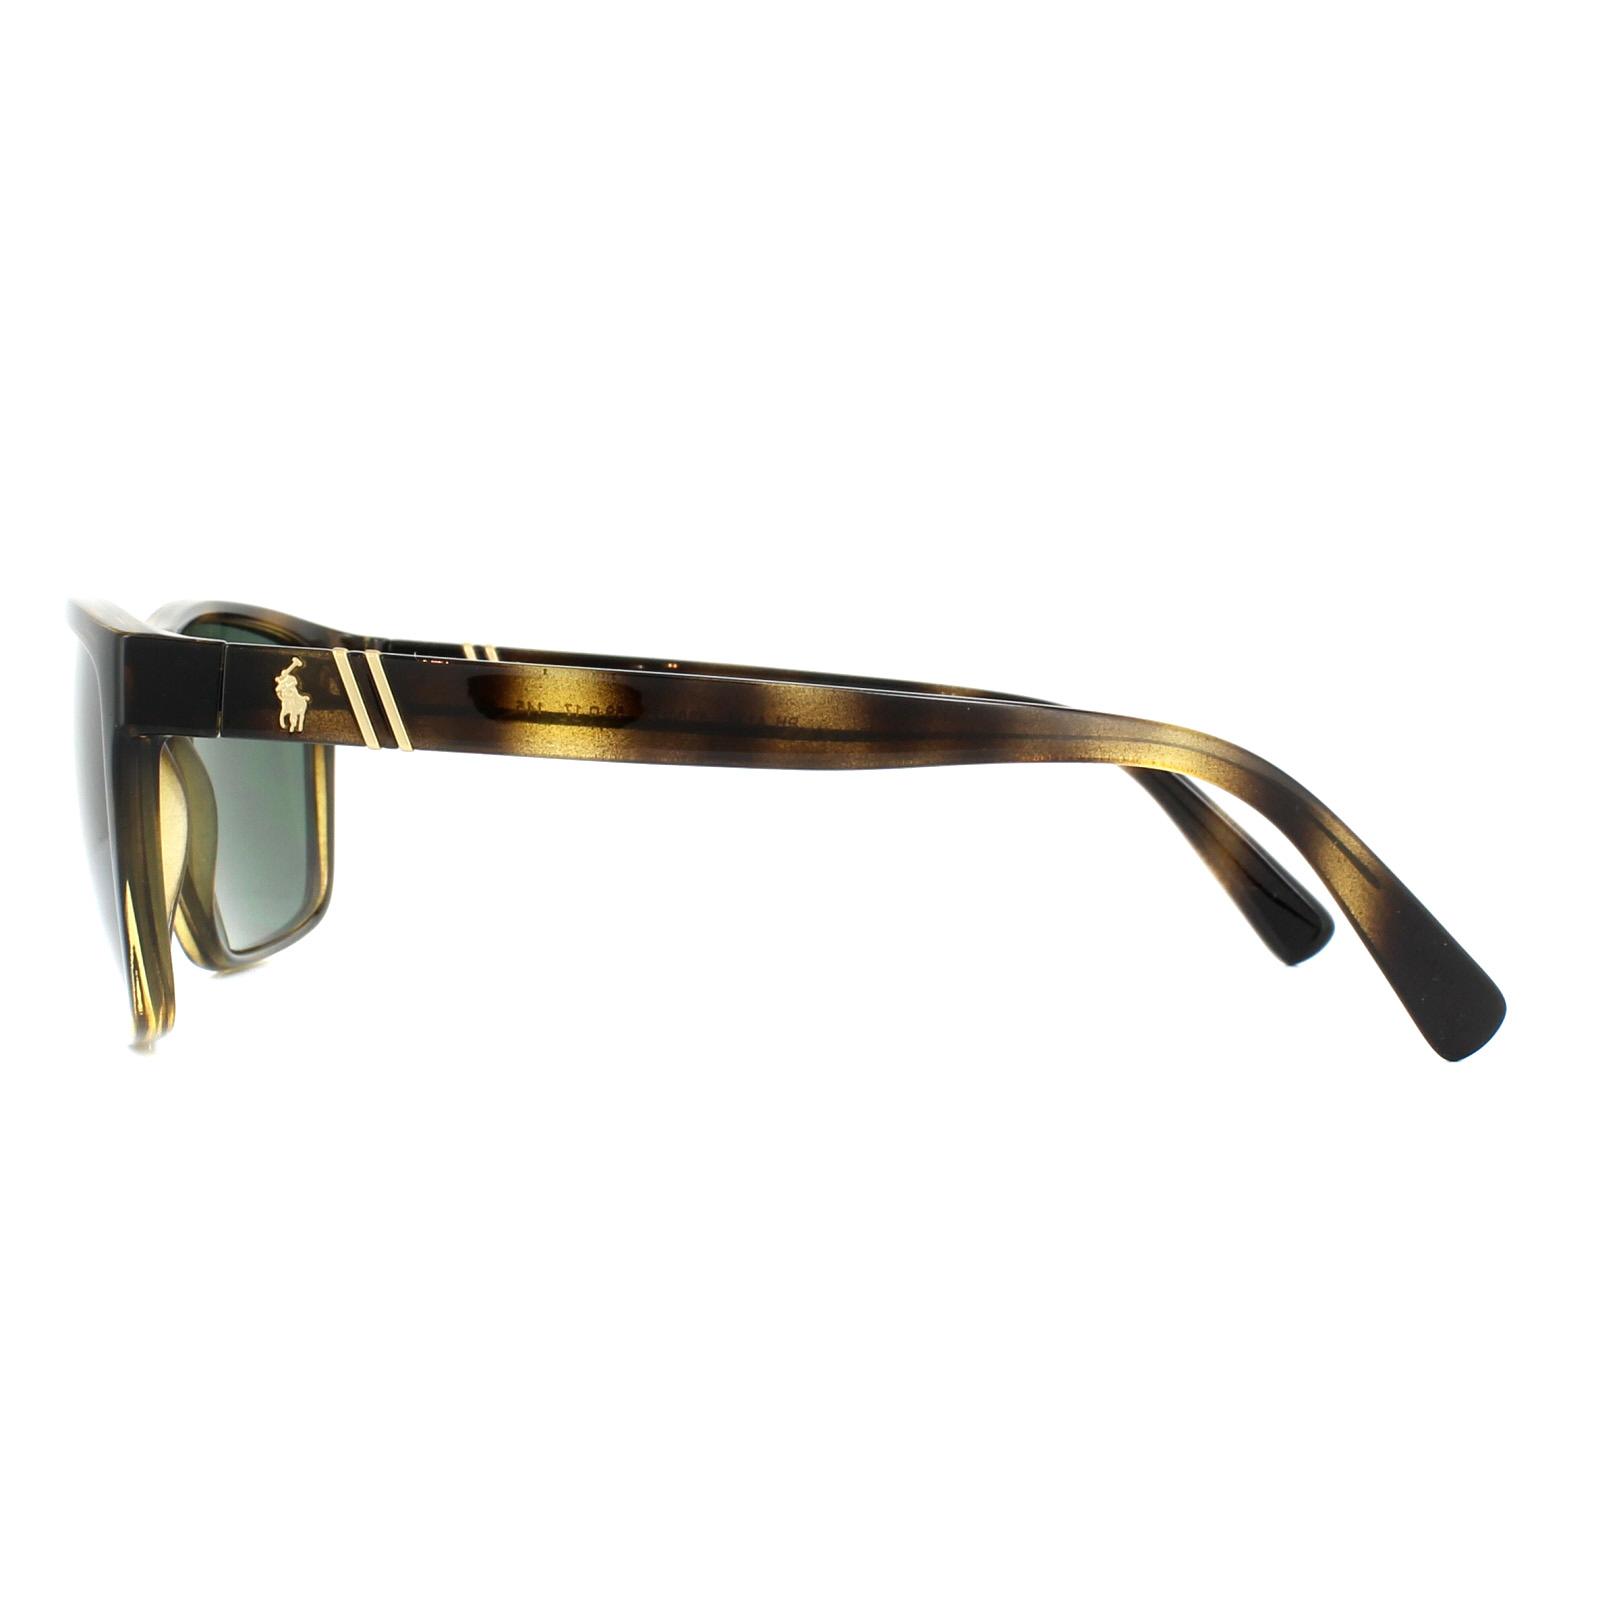 Cheap Polo Ralph Lauren PH4133 Sunglasses - Discounted Sunglasses 087f059f9a